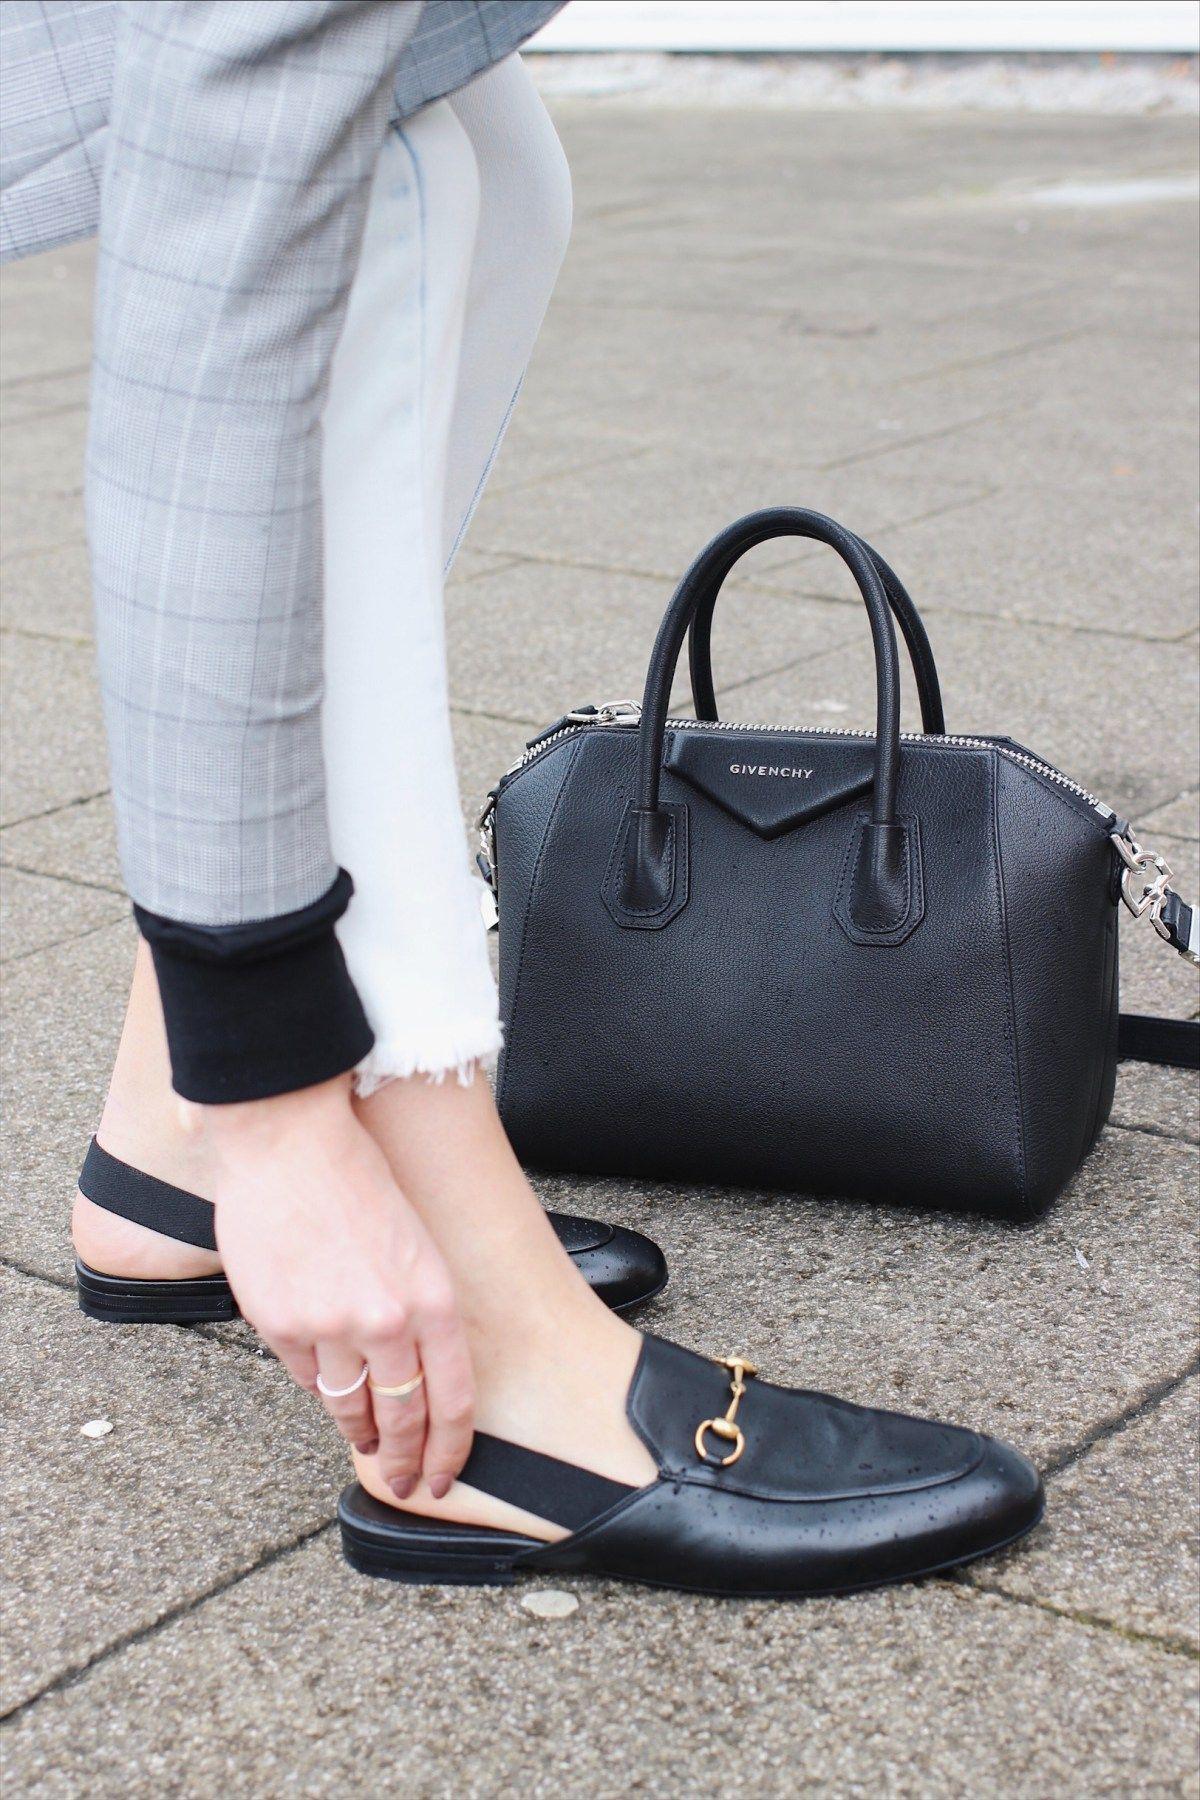 Gucci Slingback Loafers and Givenchy Antigona black street style